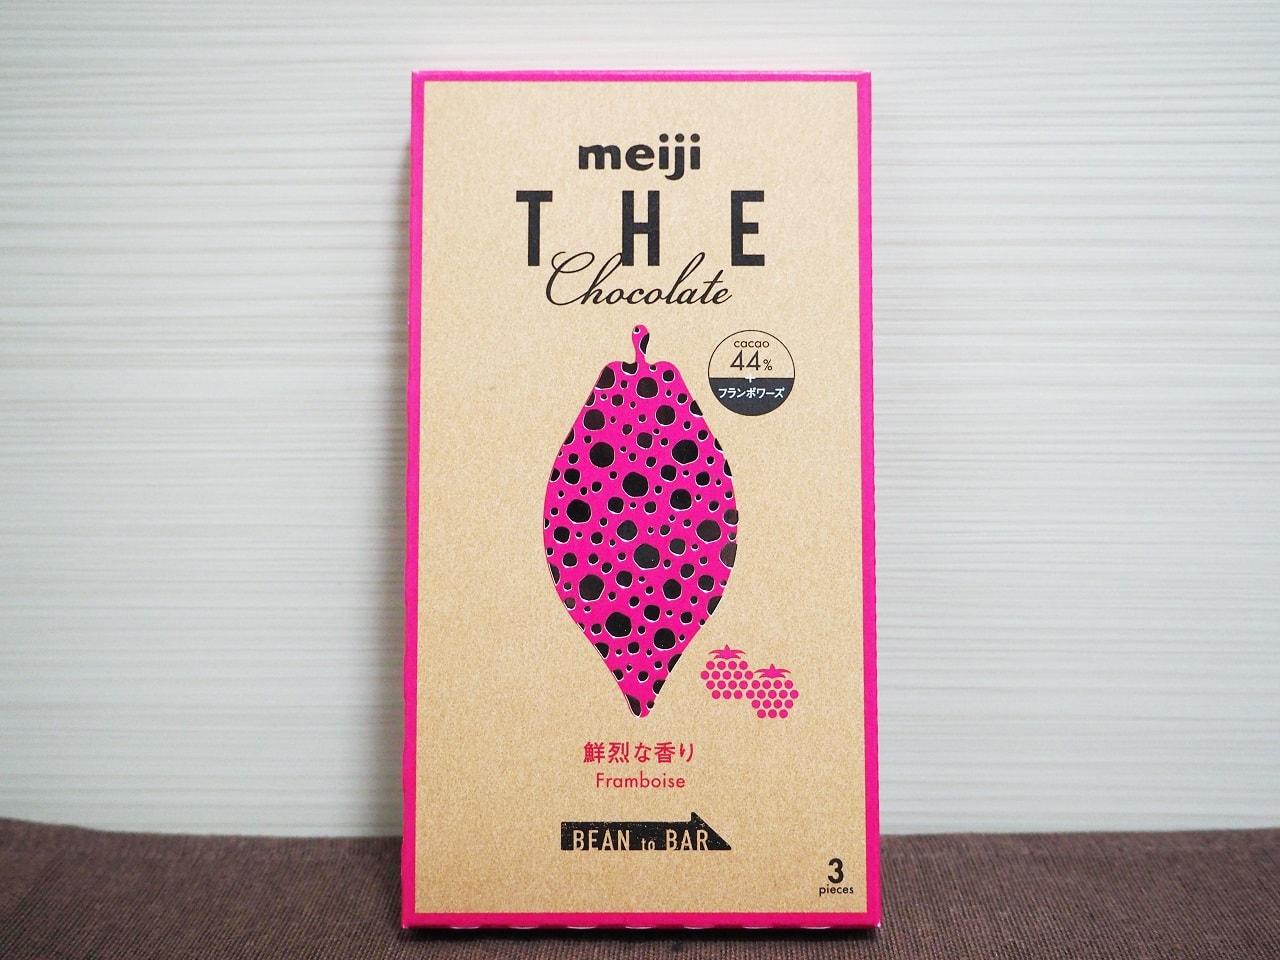 meiji-the-chocolate-20